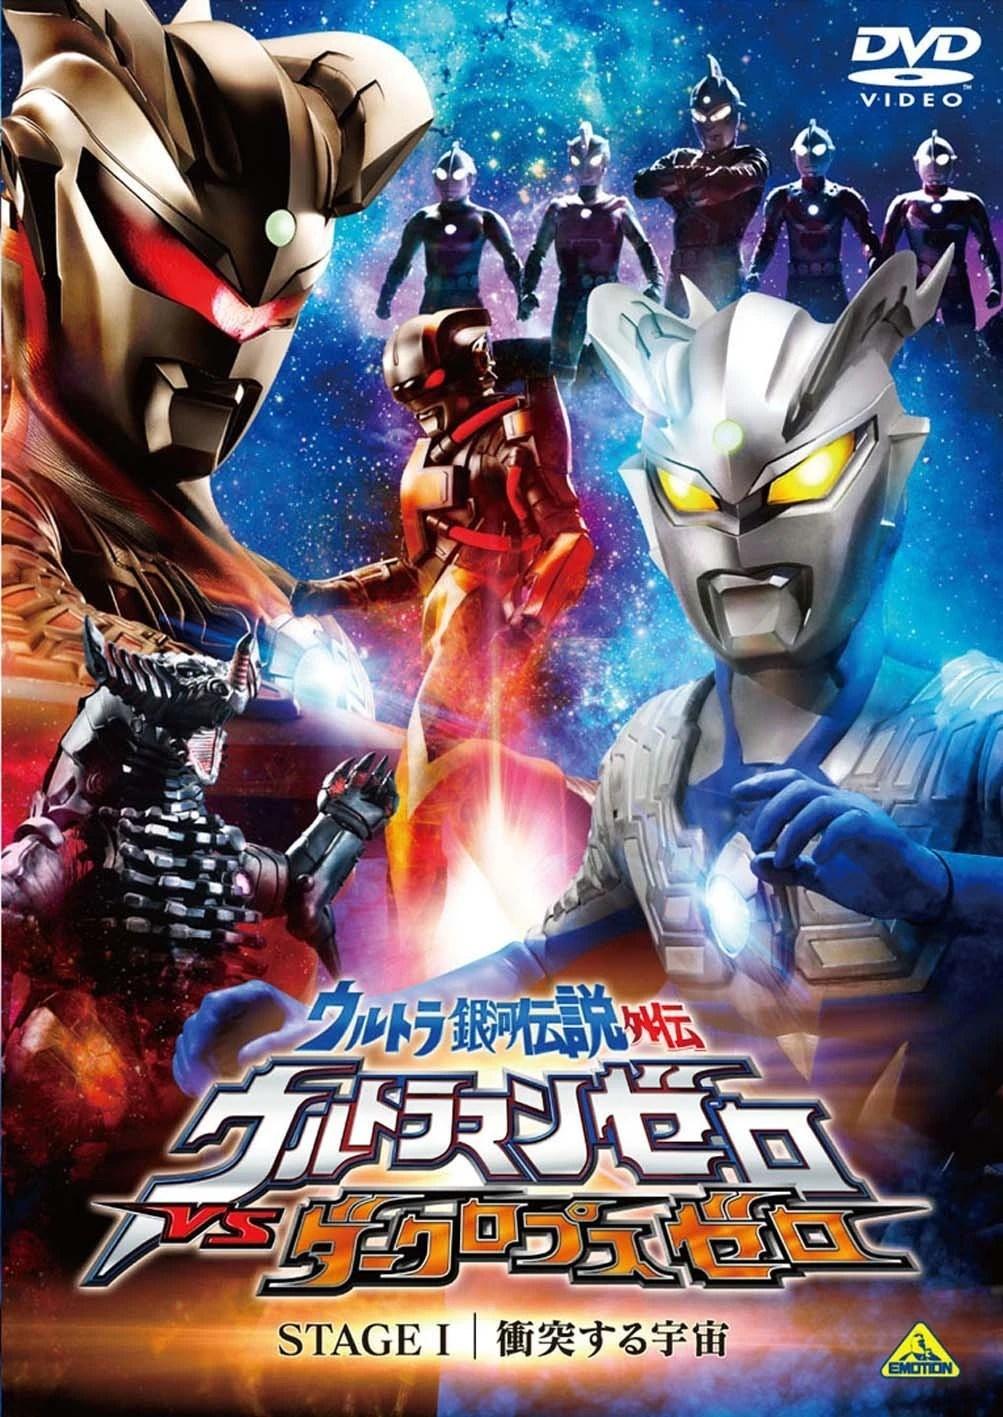 Ultra Galaxy Legend Gaiden Ultraman Zero Vs Darklops